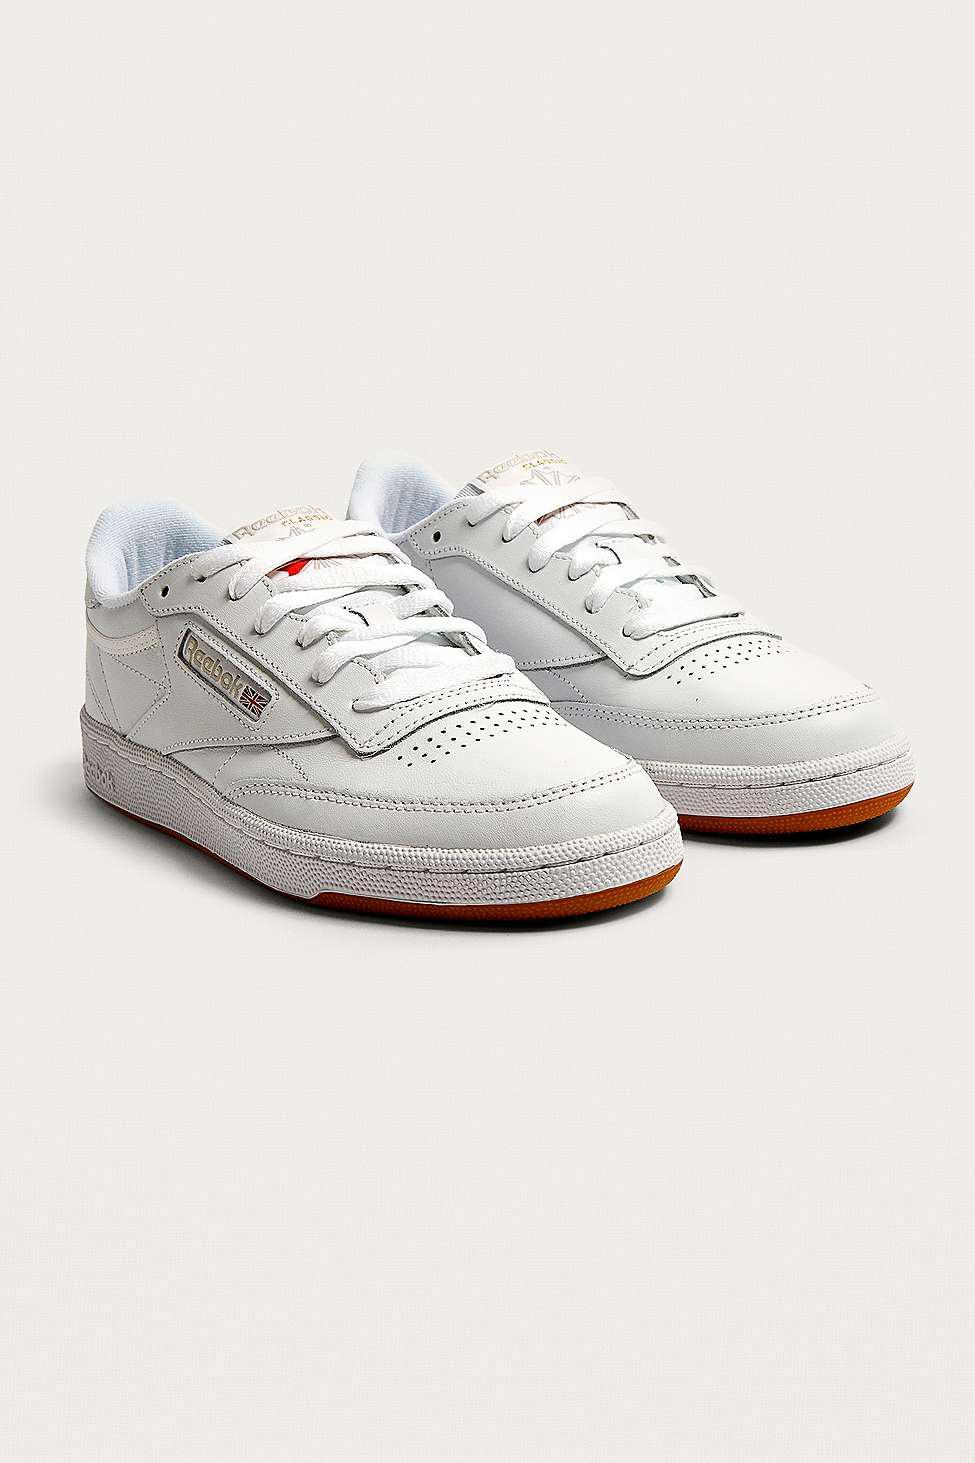 Reebok Leather White Club C 85 Gum Sole Trainers